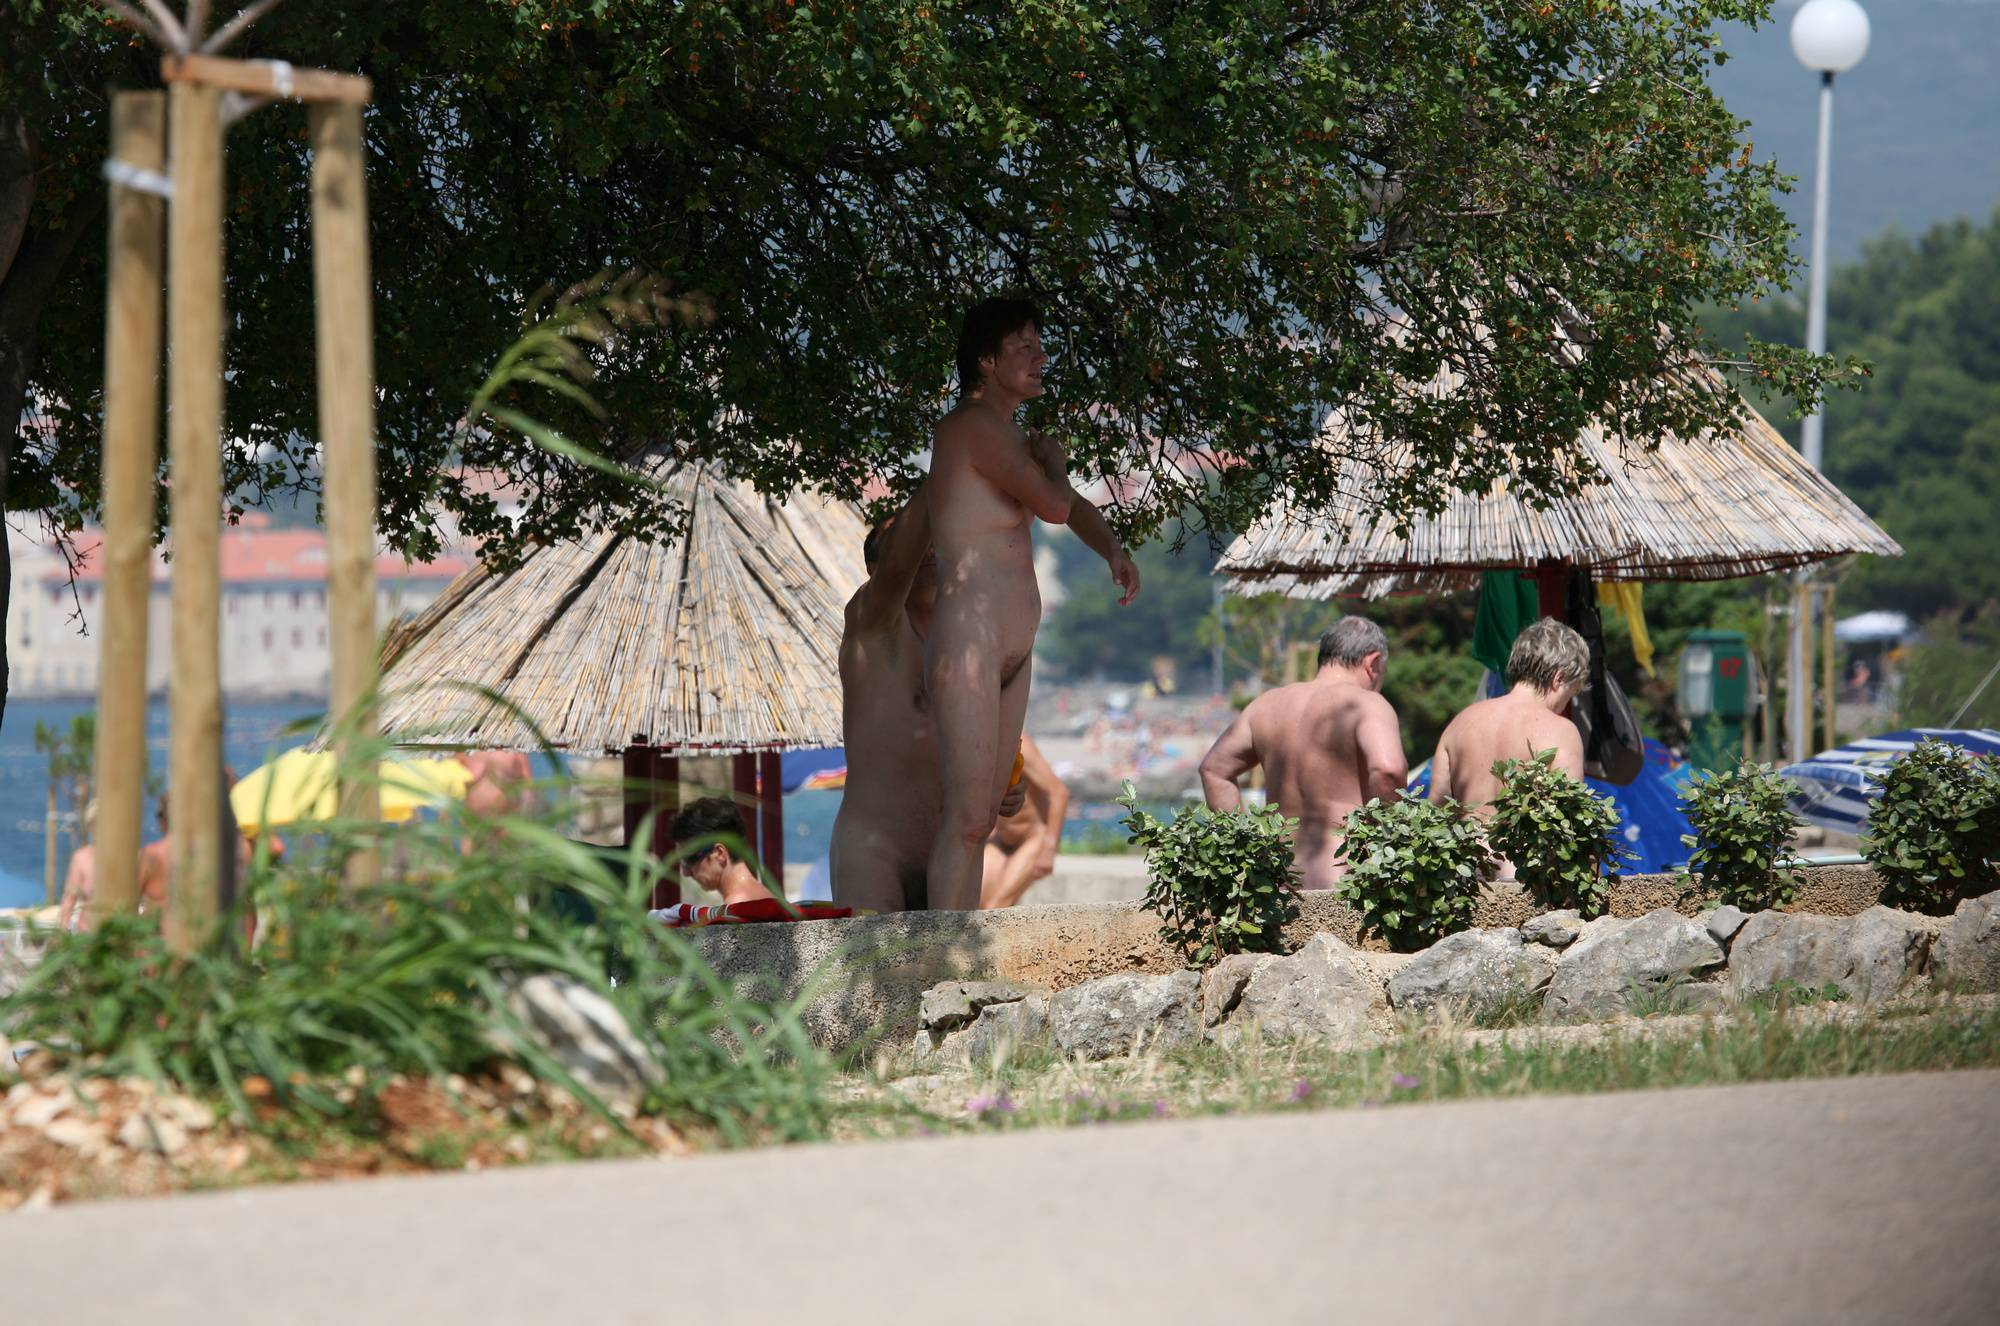 Pure Nudism Photos Bondi Beach-Park Grounds - 2